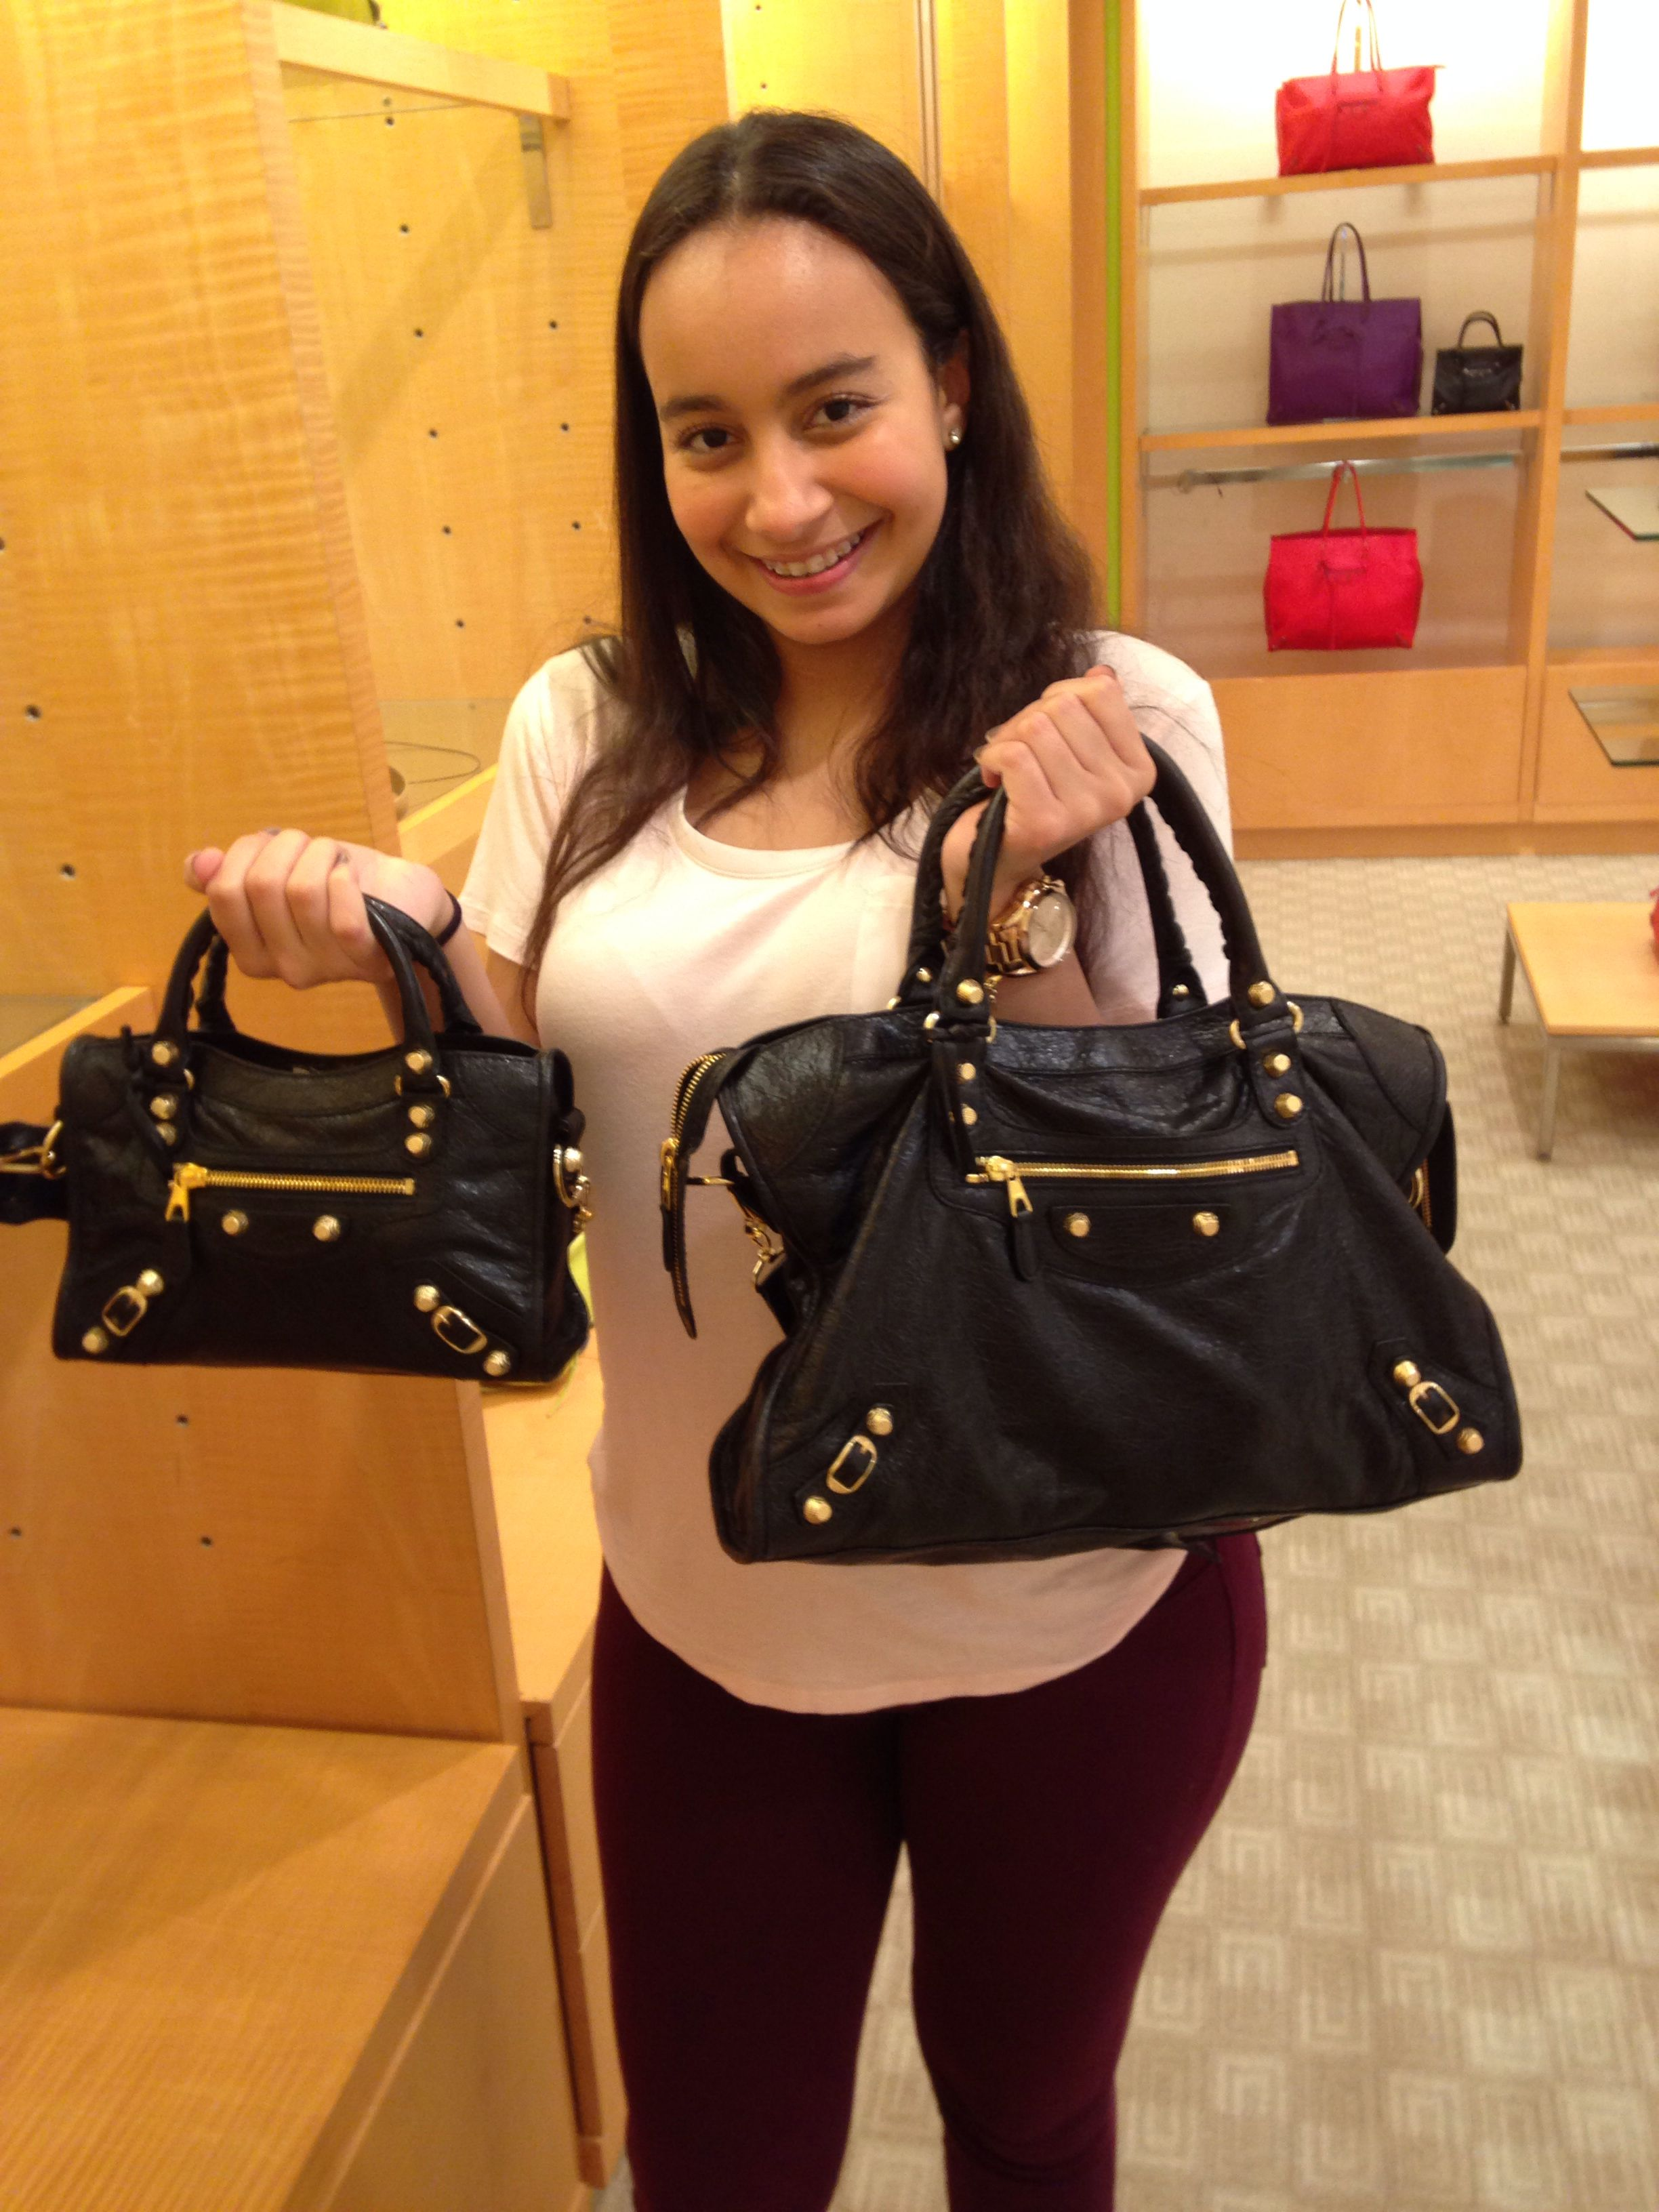 3ed442ac18 On my right is my Balenciaga Giant 12 City Bag on the left is the Mini  version of my bag soooooo cute!